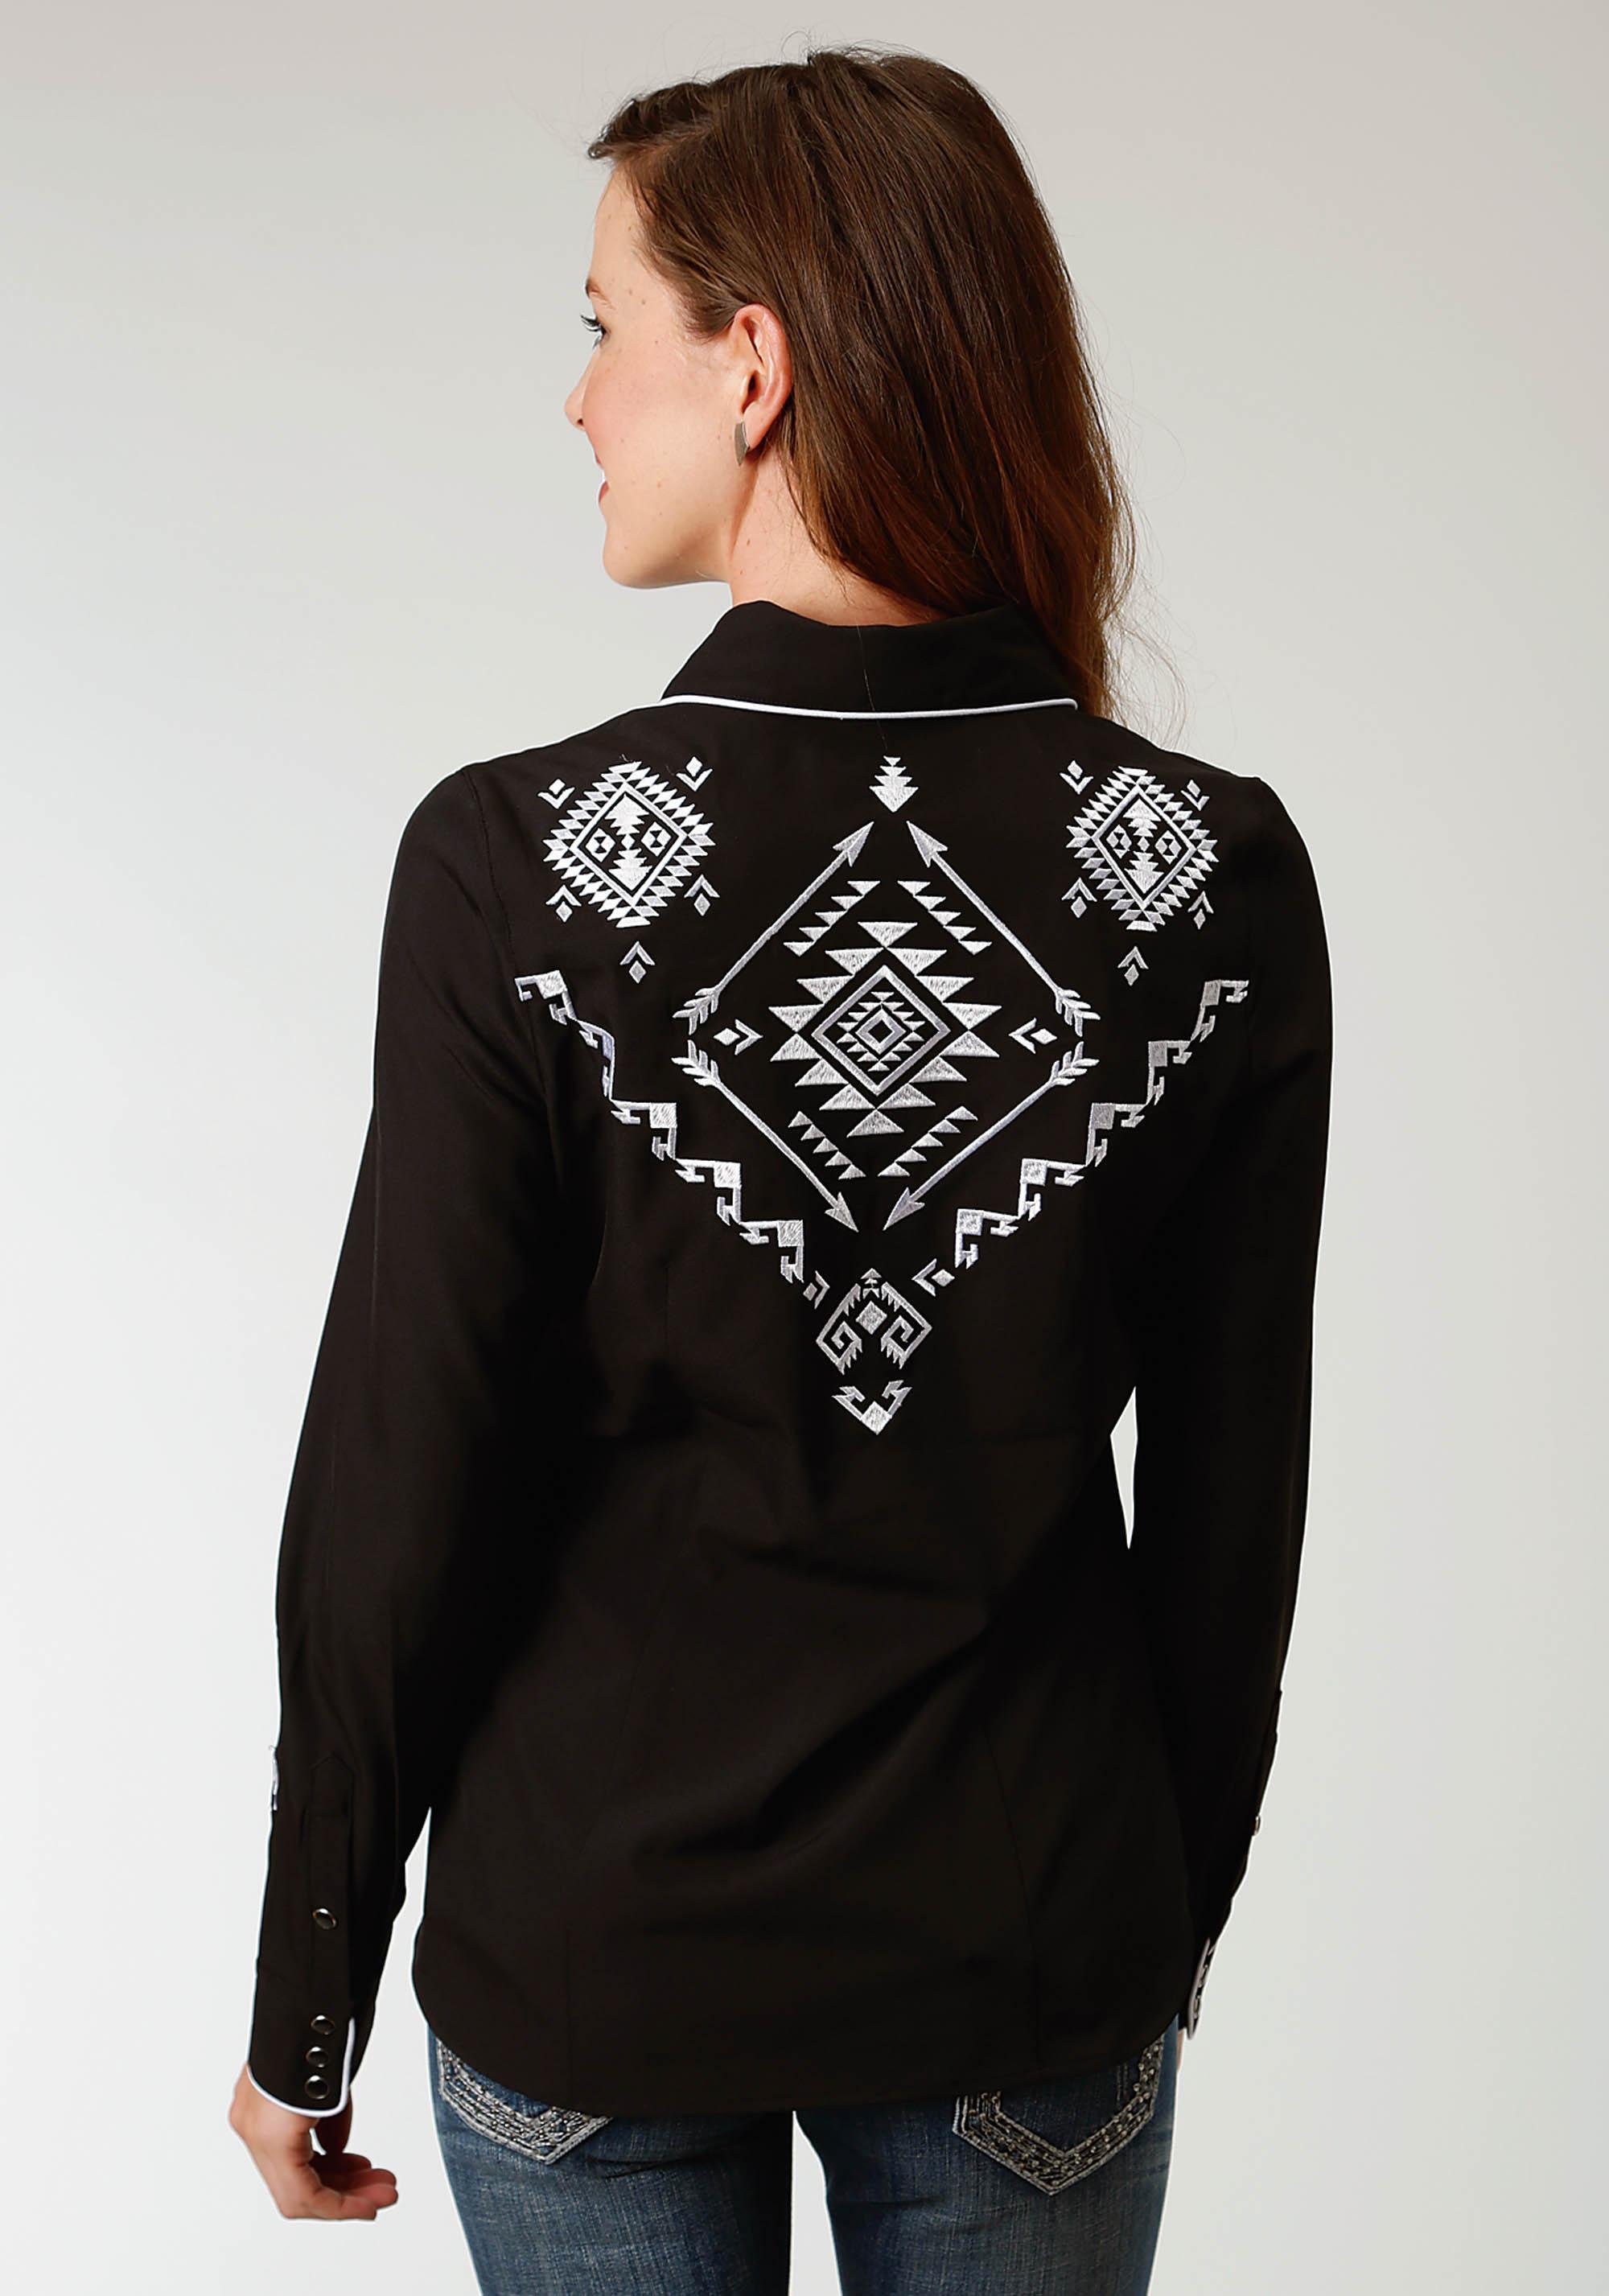 Details about  /Roper Western Shirt Womens L//S Snap Print Blue 03-050-0064-0764 BU